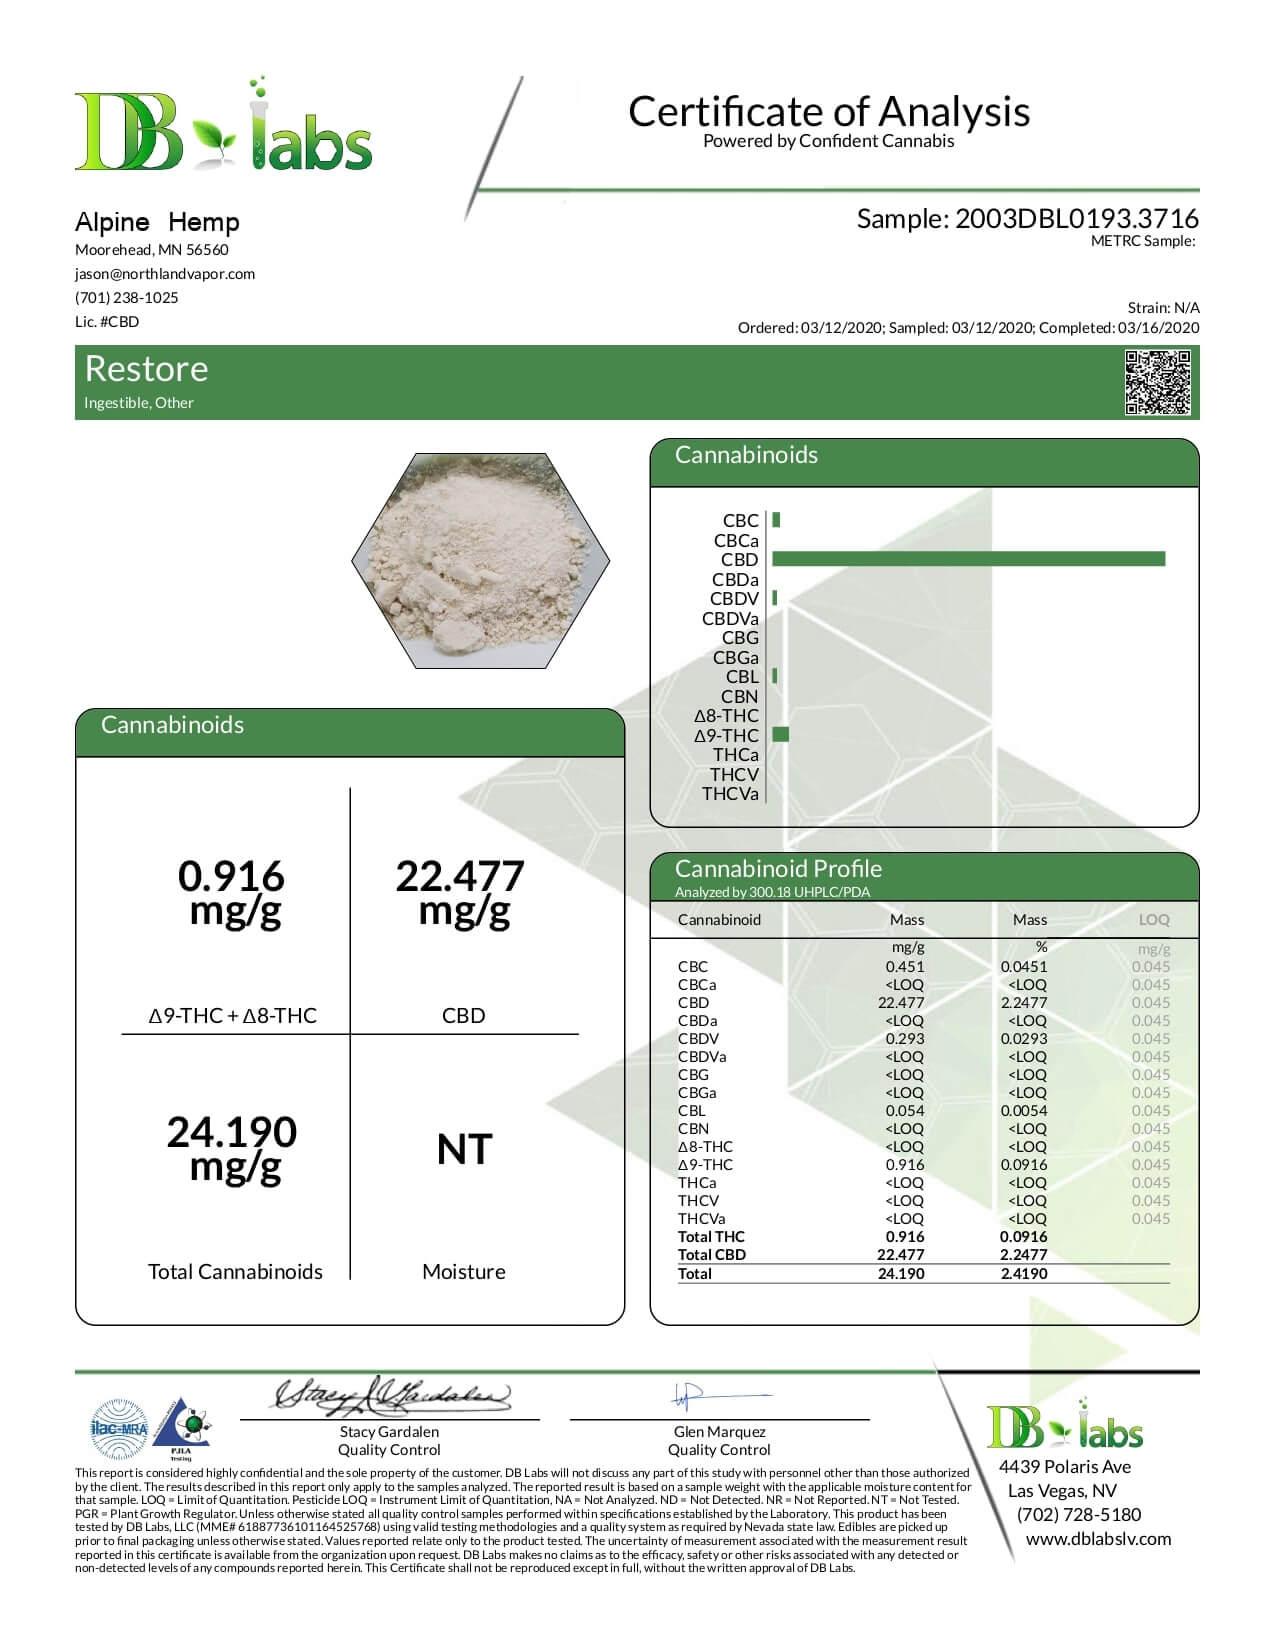 Alpine Hemp CBD Capsule Restore Lab Report